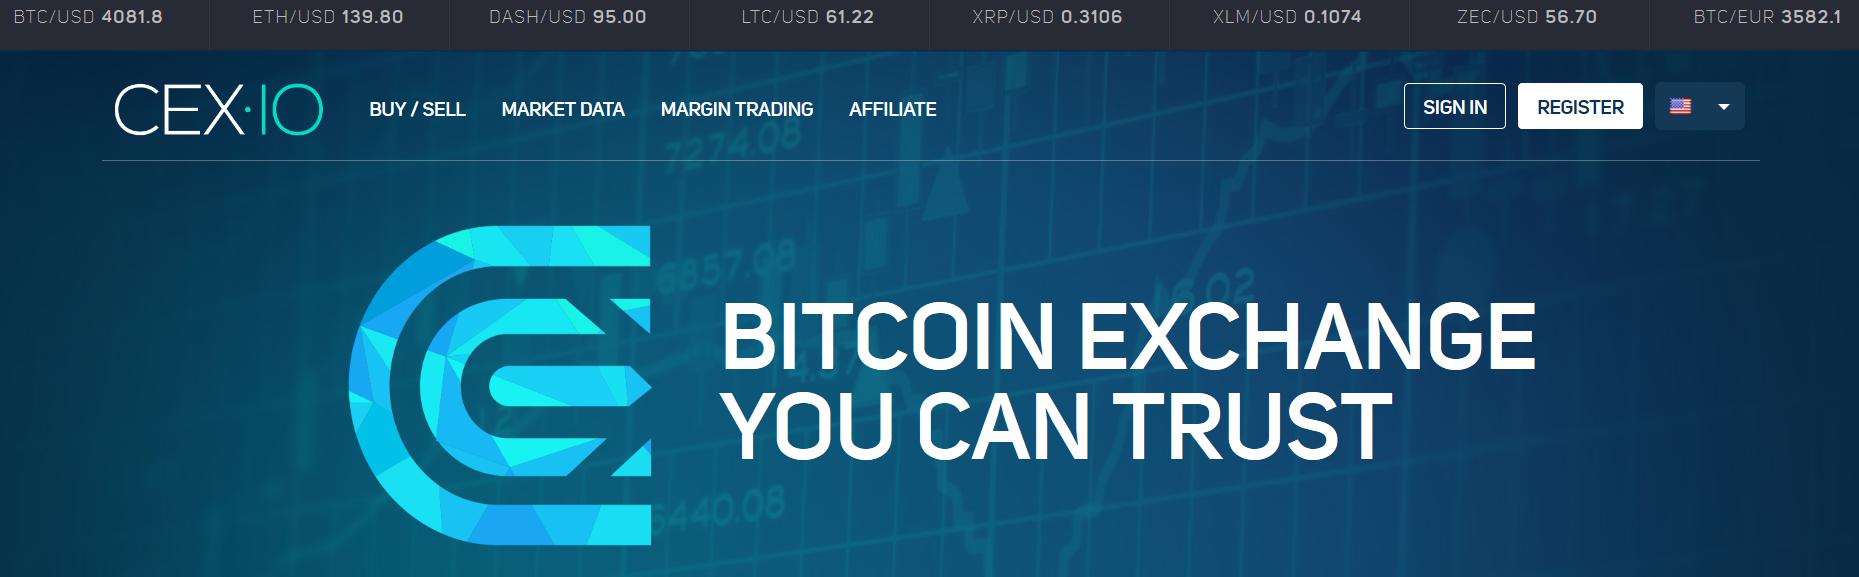 CEX.IO-Website